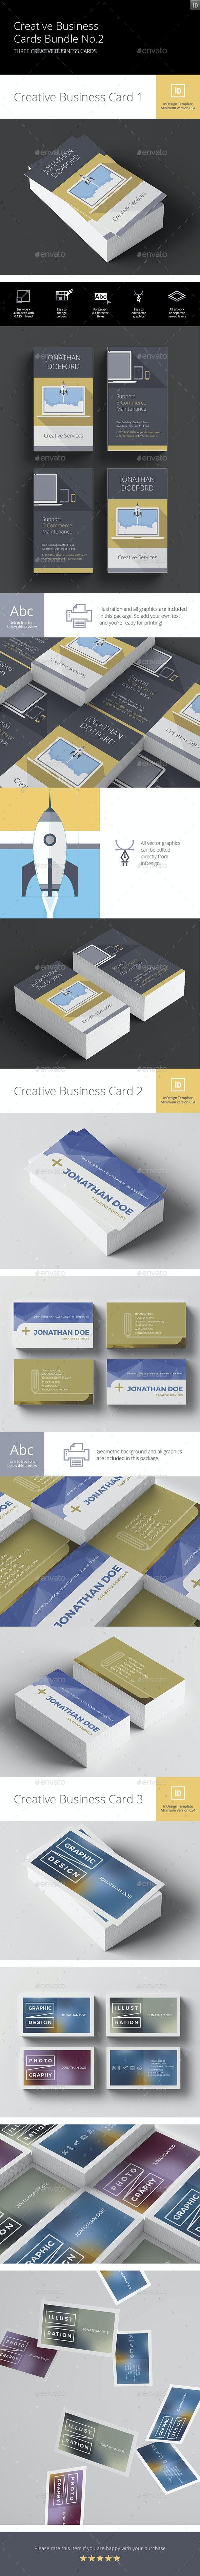 Creative Business Cards Bundle No.2 - Creative Business Cards